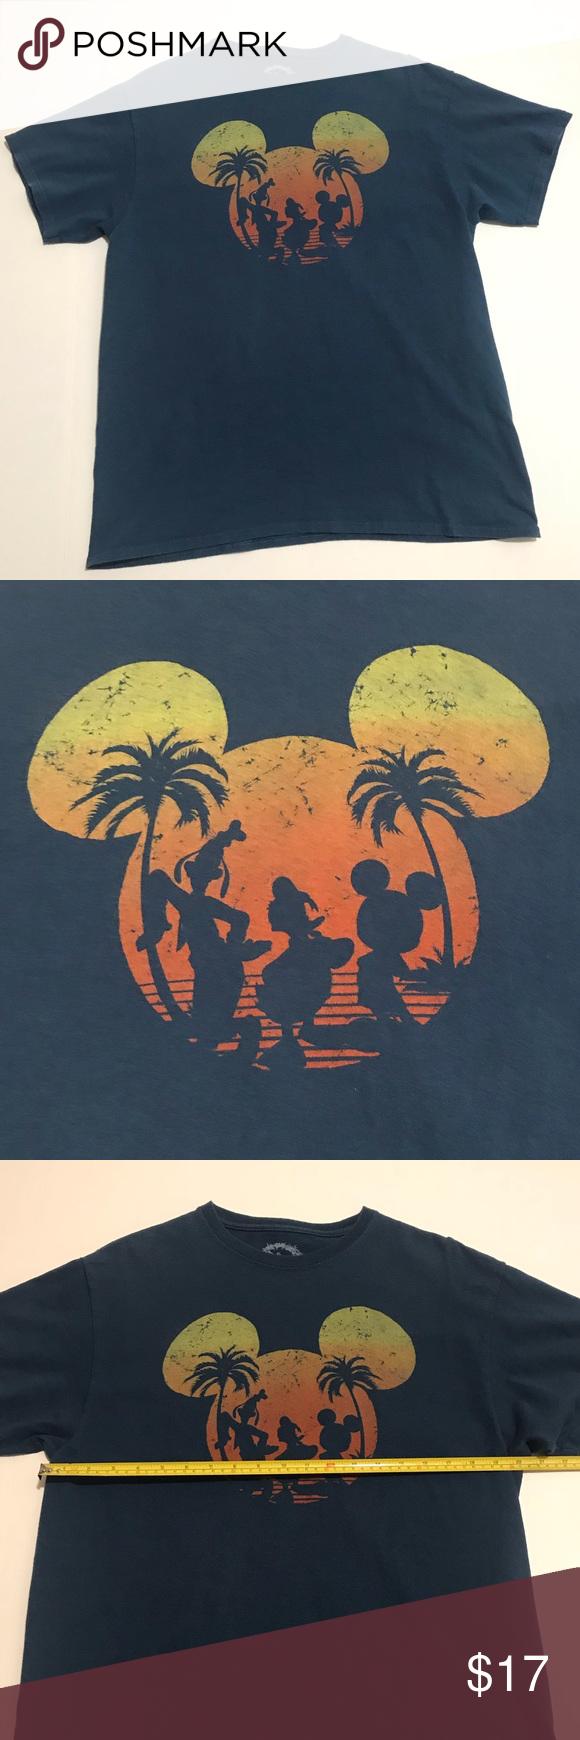 SOLD Disney sunset Mickey Mens shirt Blue size lg Shirts